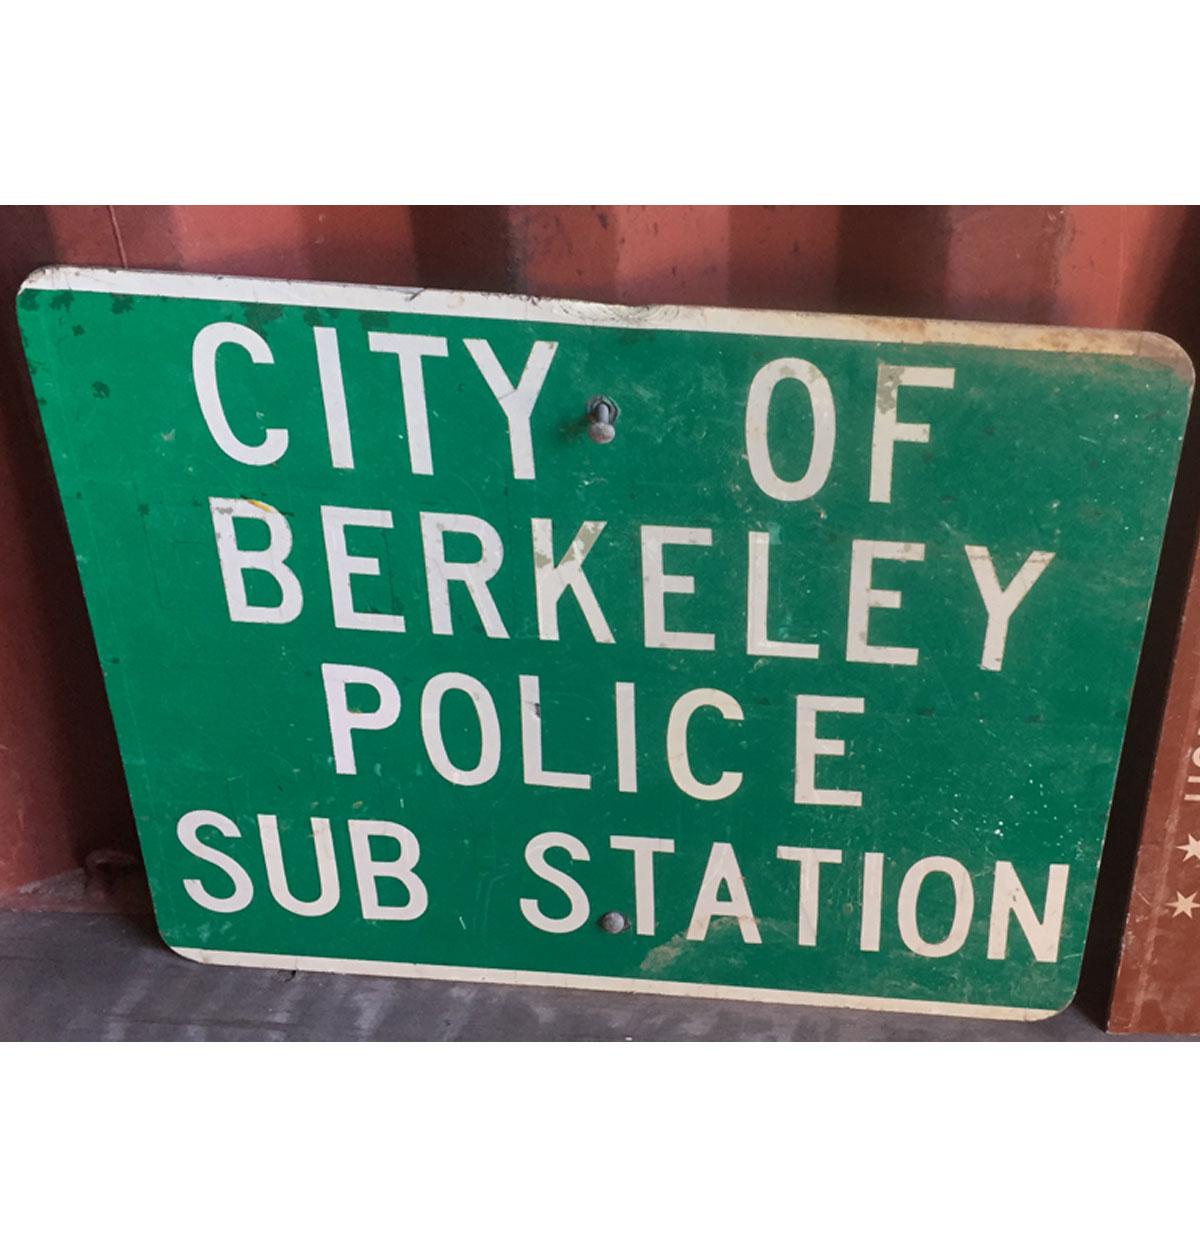 Origineel City Of Berkeley Police Sub Station Metalen Straatbord